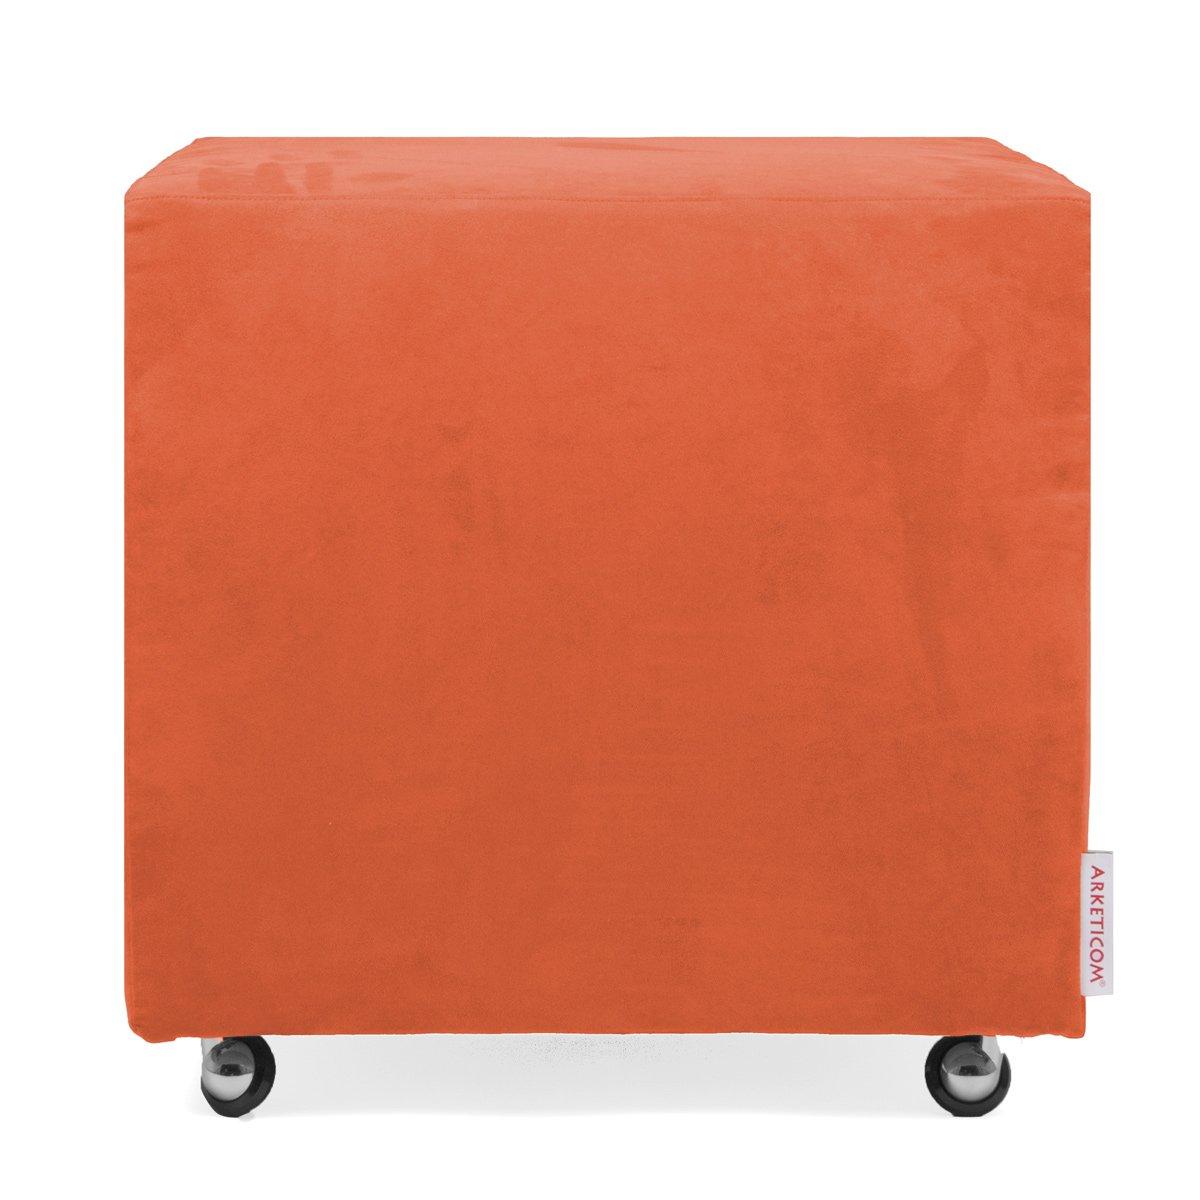 Arketicom Beanbag Cube removable Microfiber Cover, Sizes, black, 35